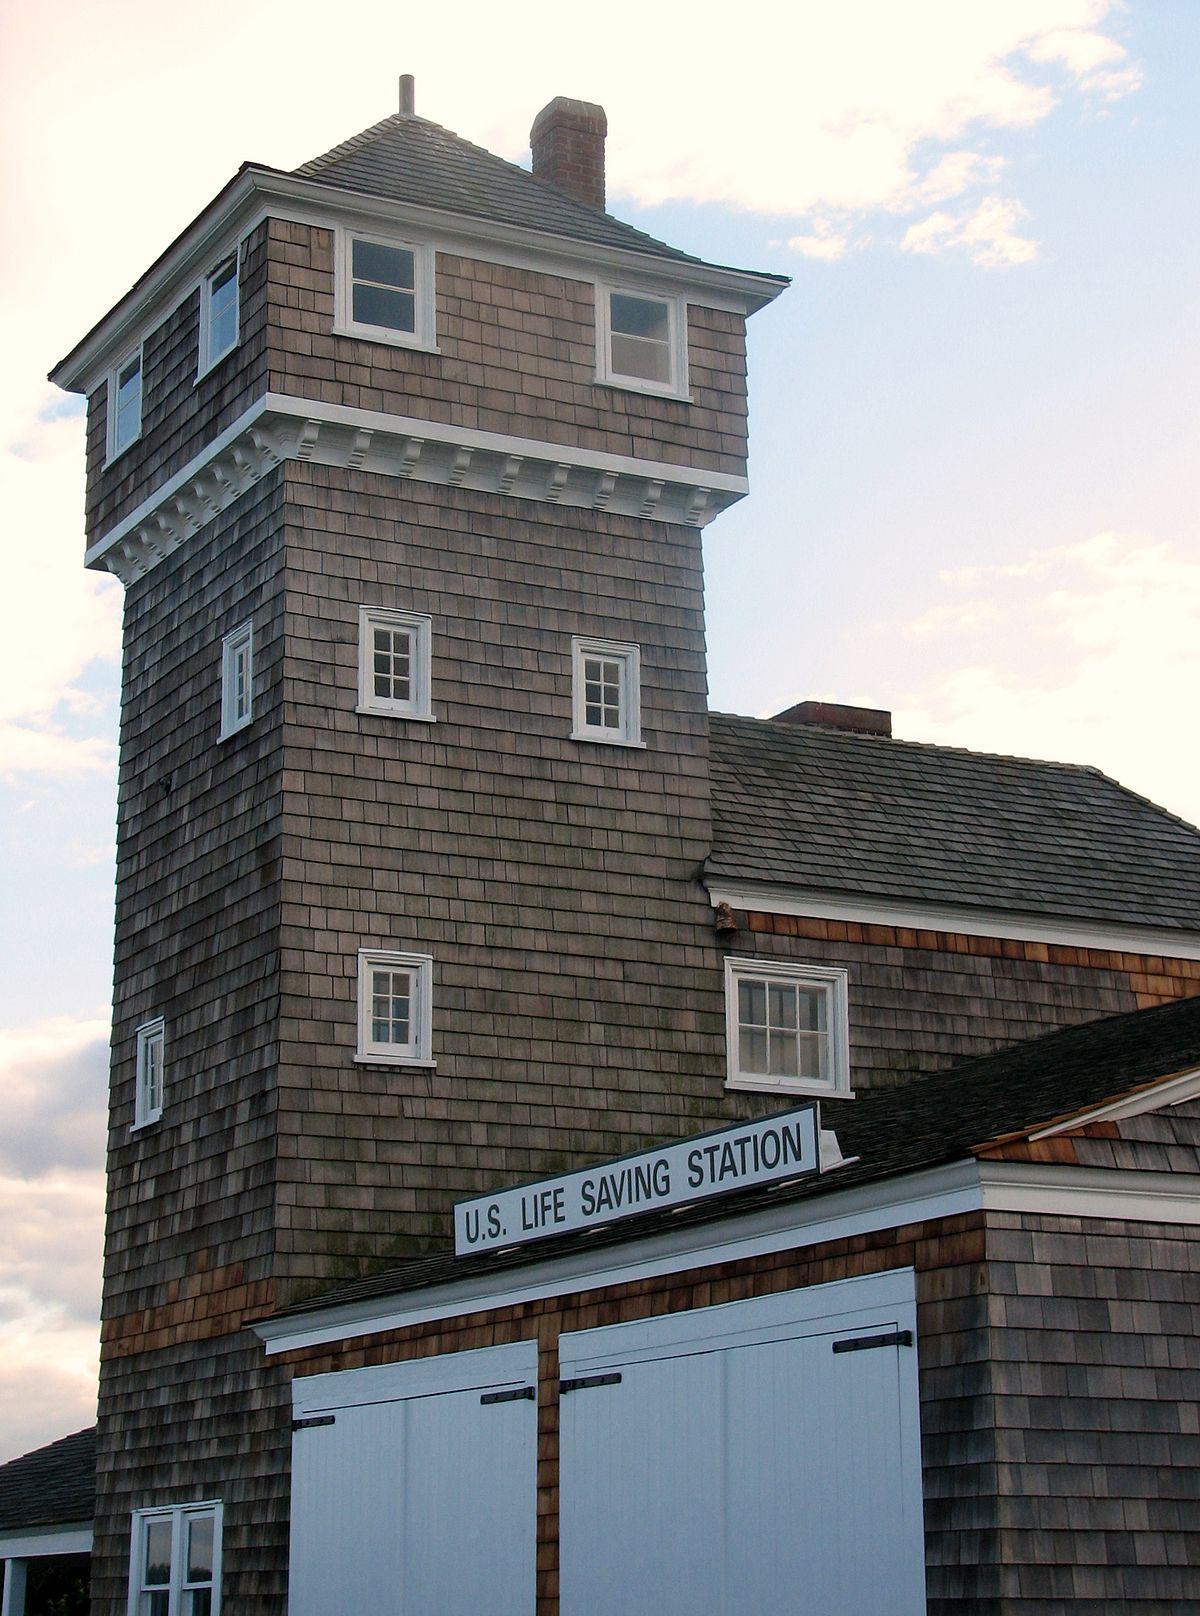 Nearest Service Station >> Fort Hancock U.S. Life Saving Station - Wikipedia